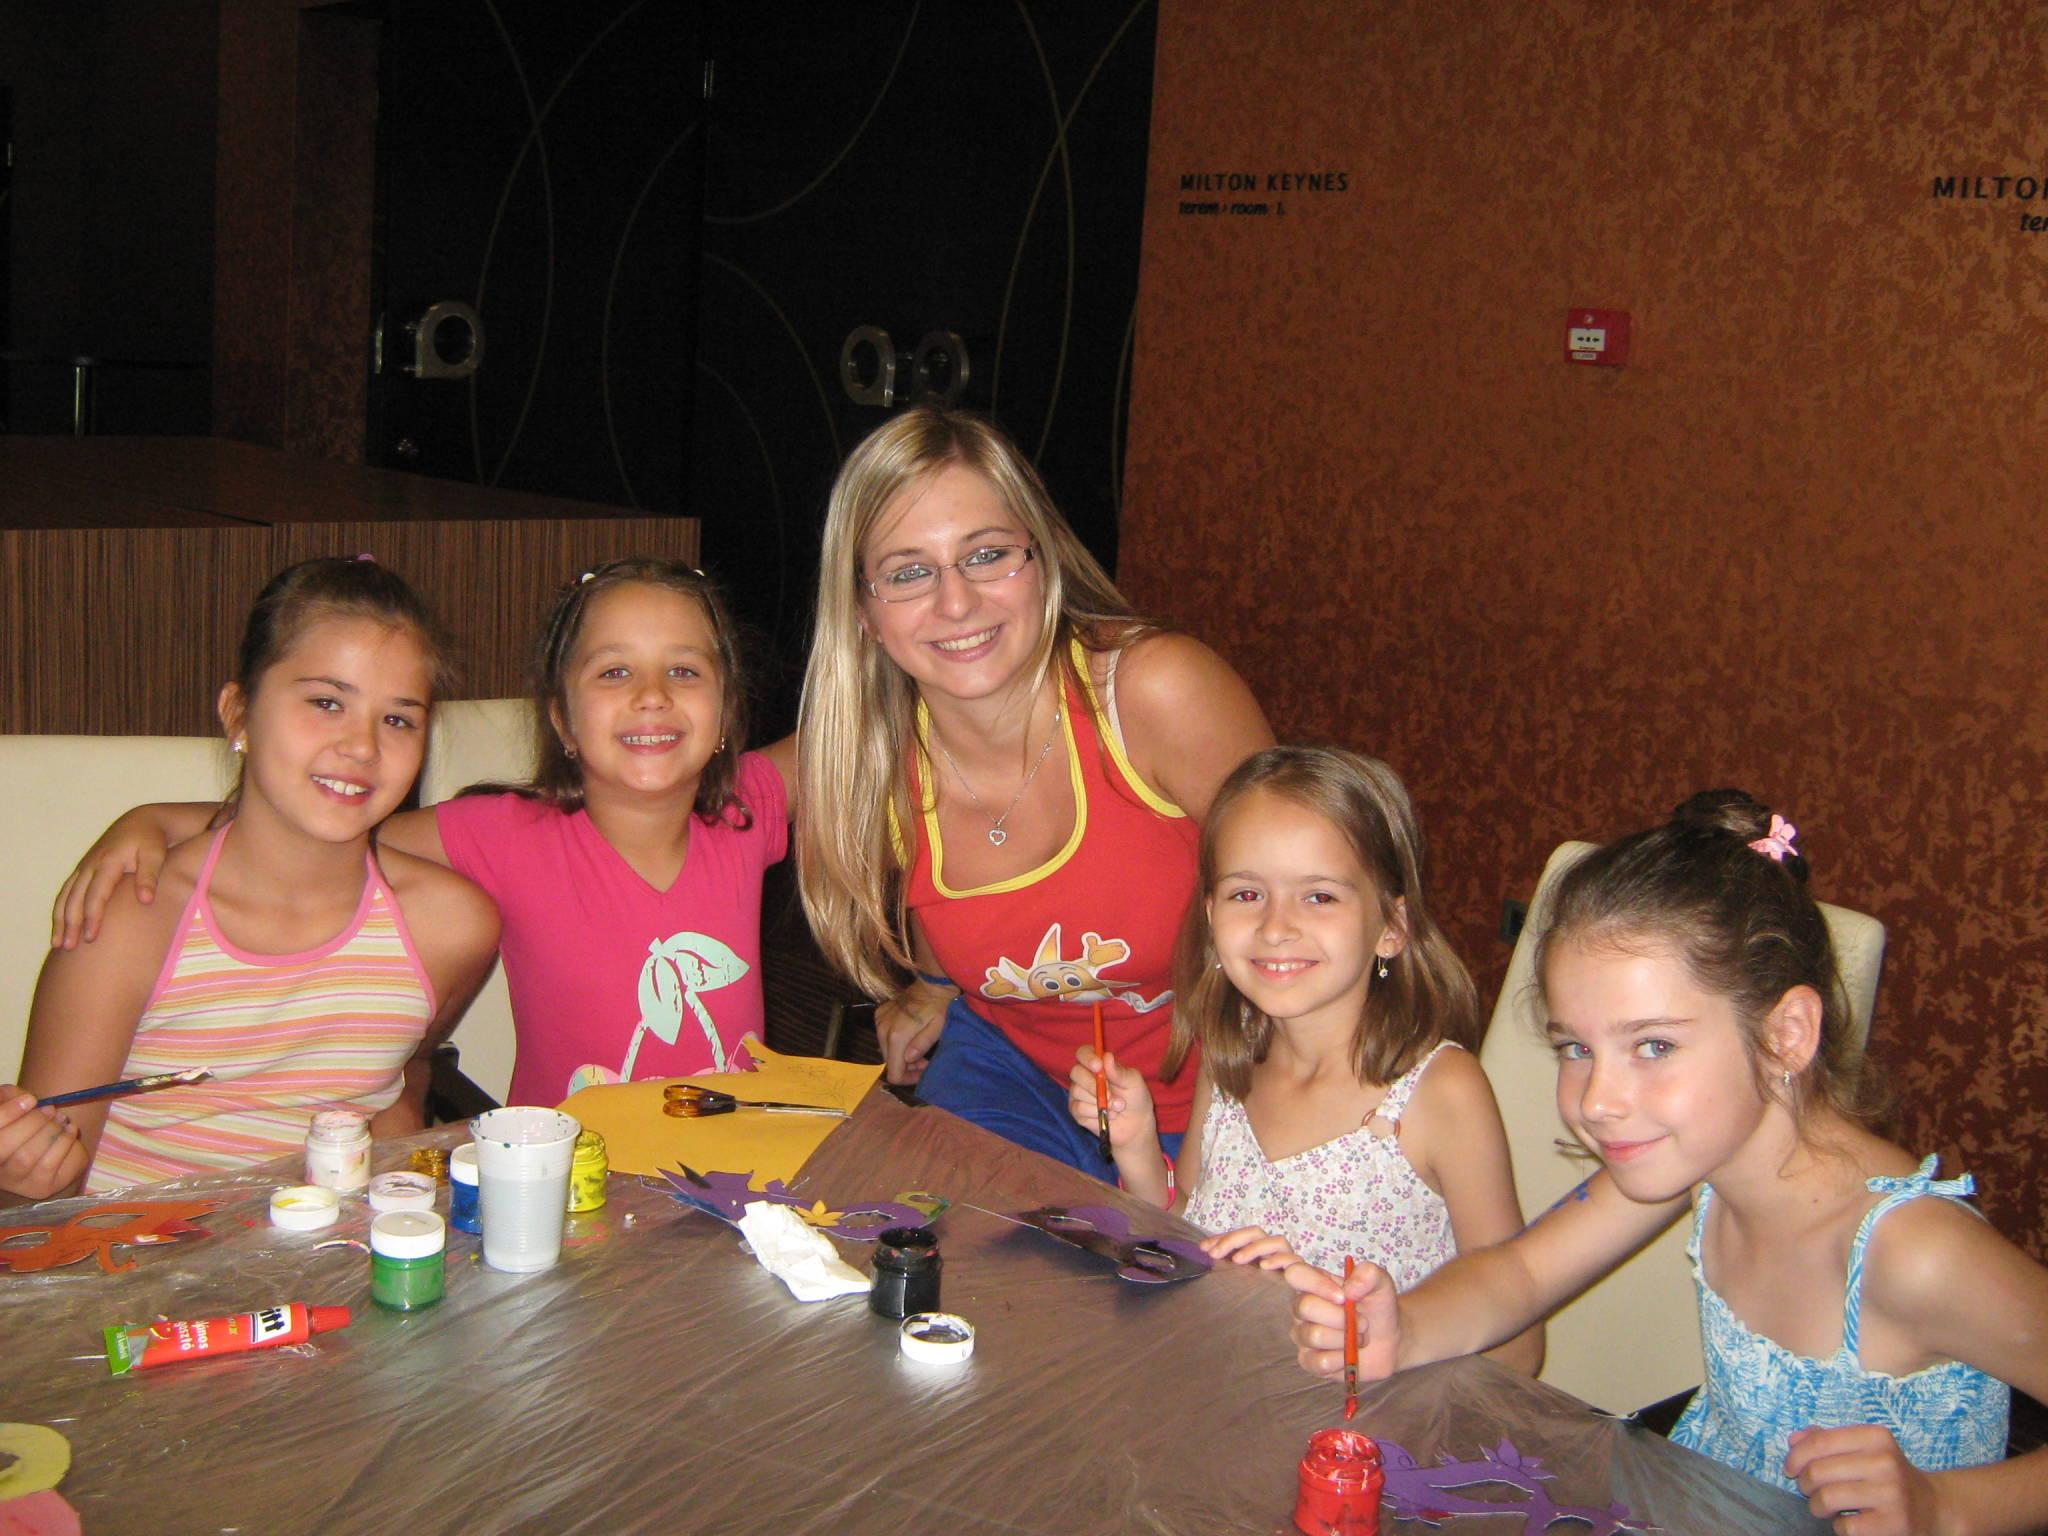 Abacus Business & Wellness Hotel Herceghalom - Gyermekanimáció